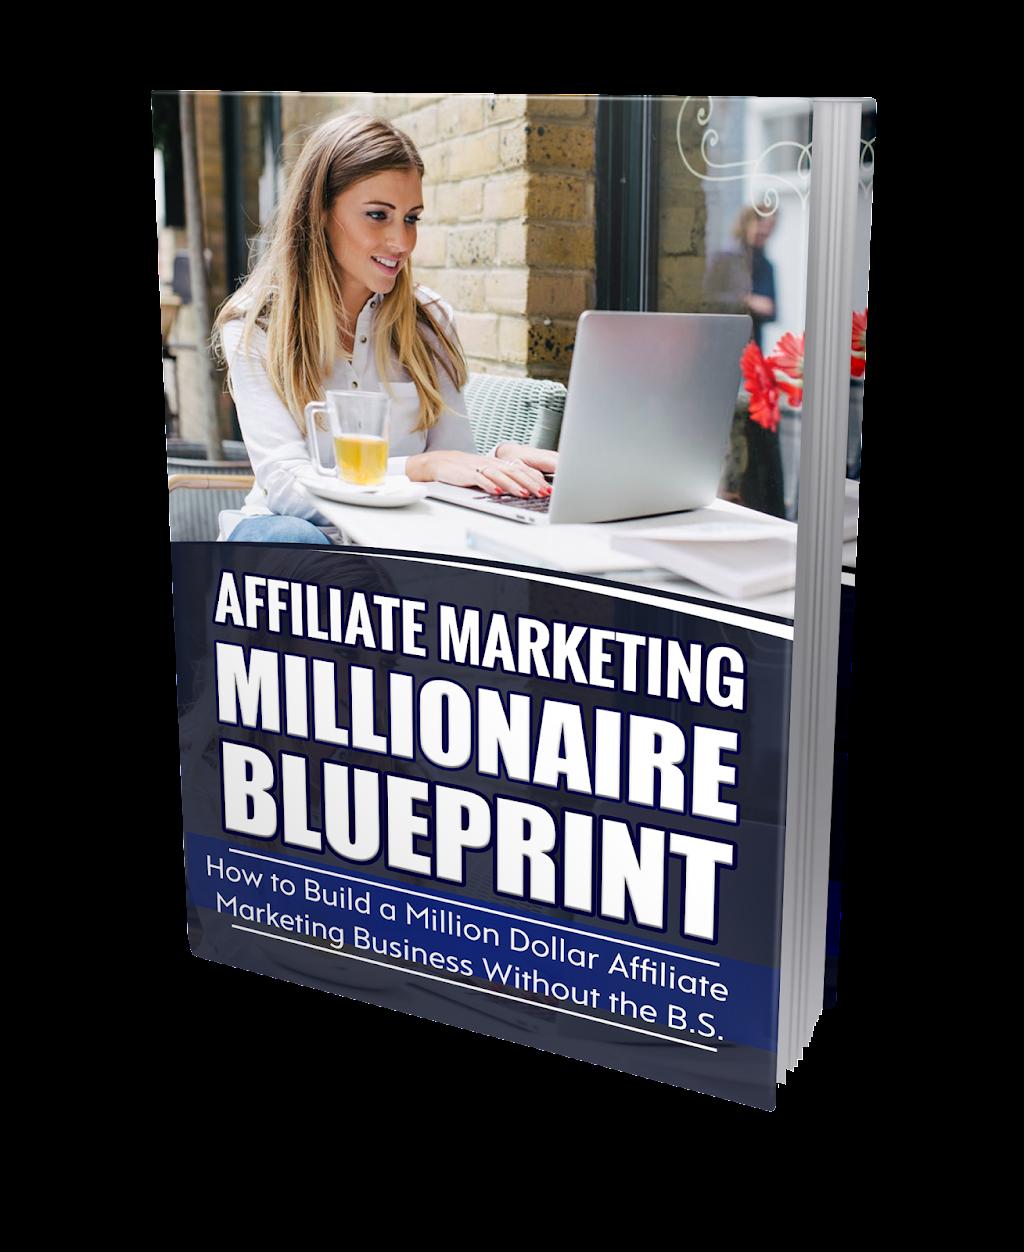 Affiliate marketing blueprint fb ad download my free ebook laptop millionaire blog malvernweather Images